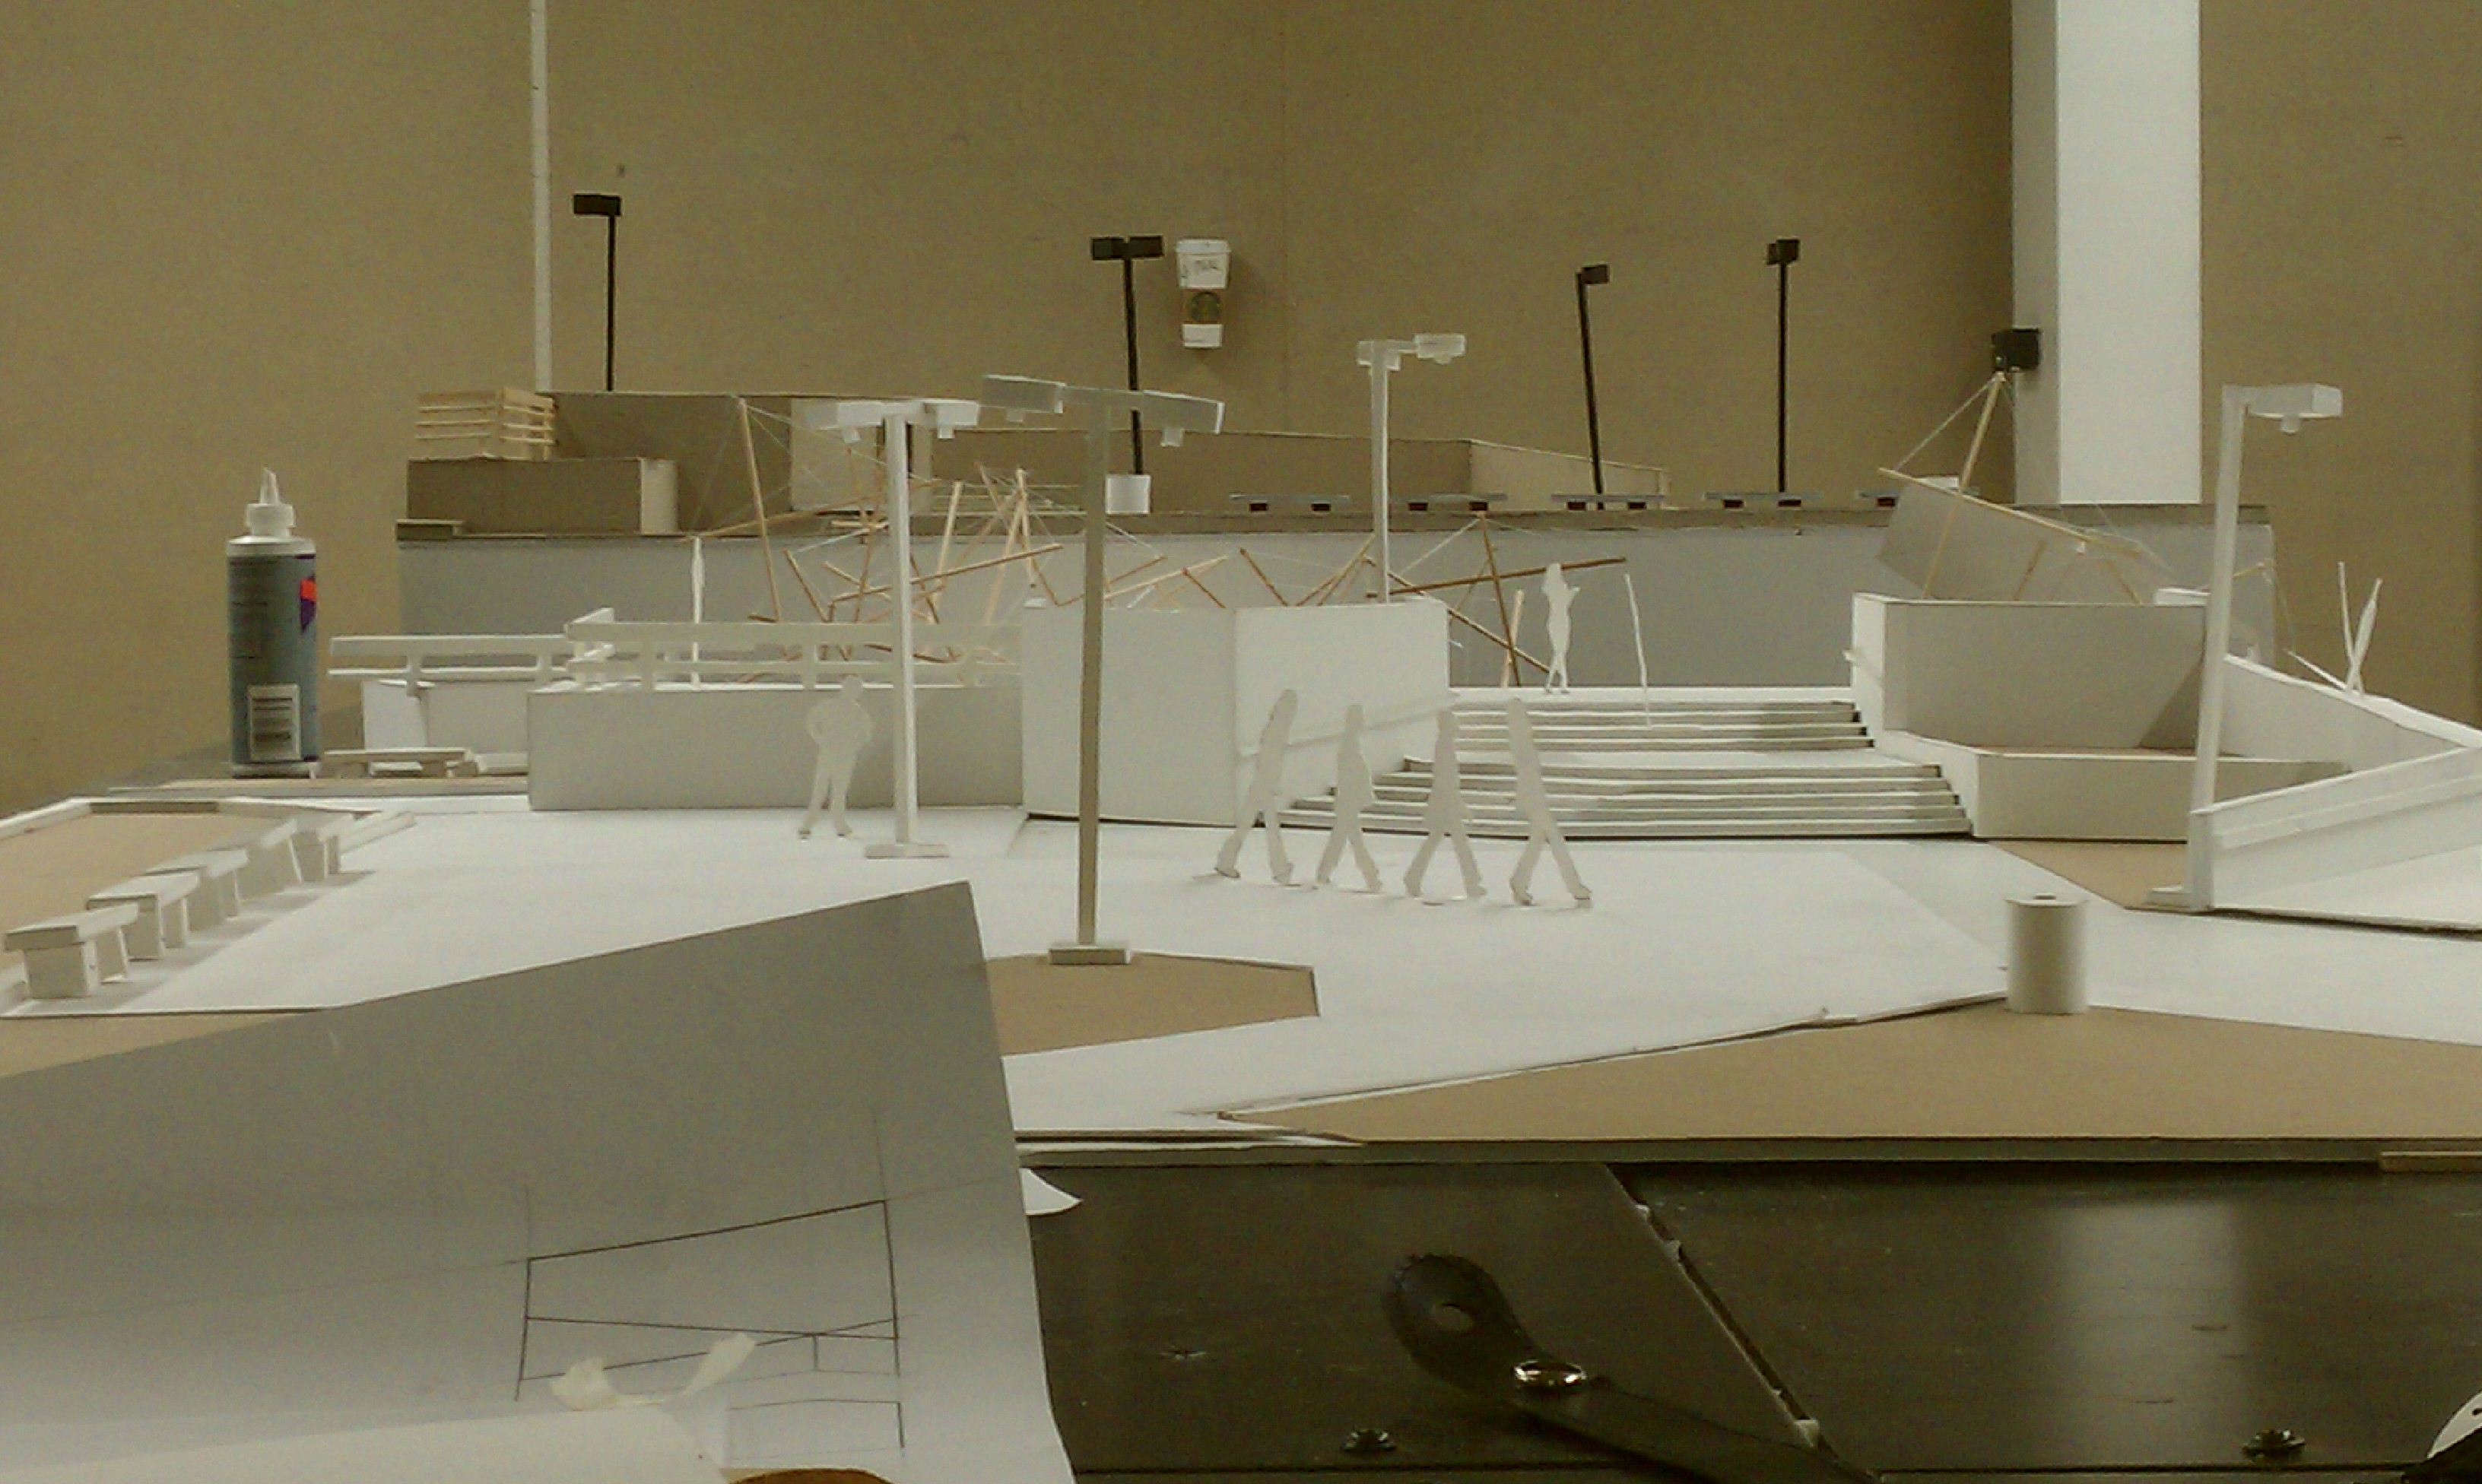 U of A Plaza 1/4th Scale Model